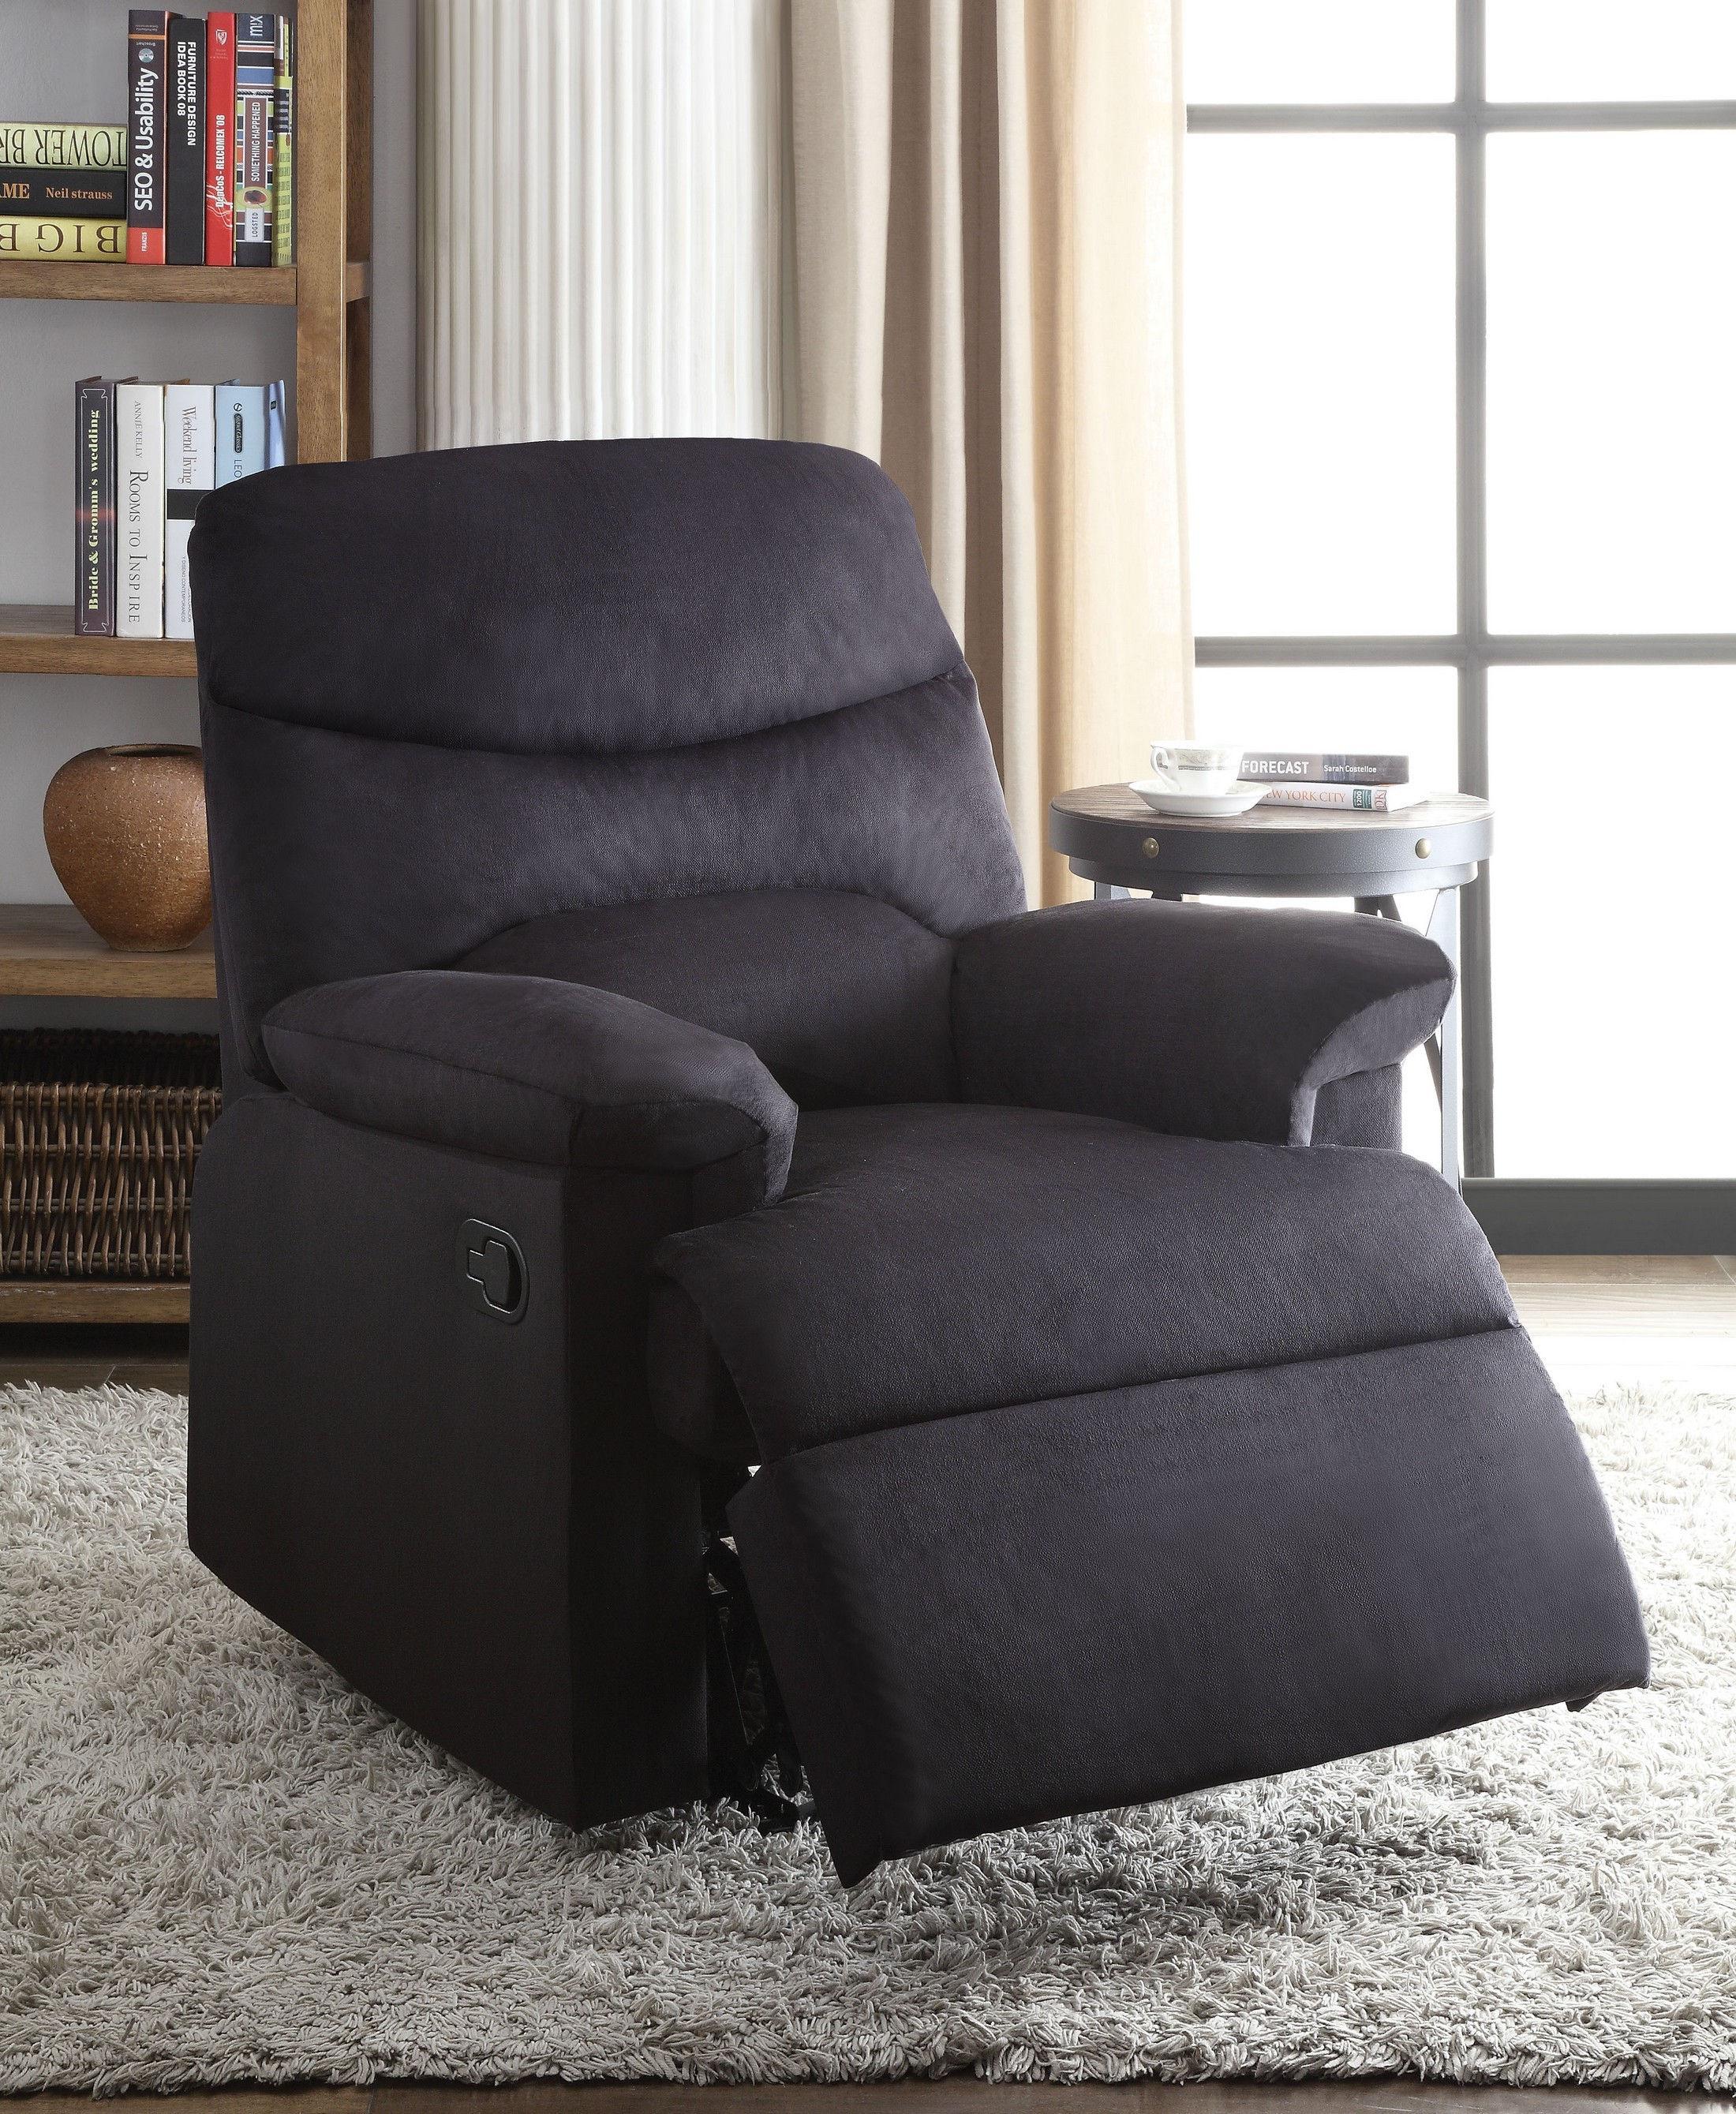 Arcadia Black Chair 00701 Acme Corporation Recliner Sofas